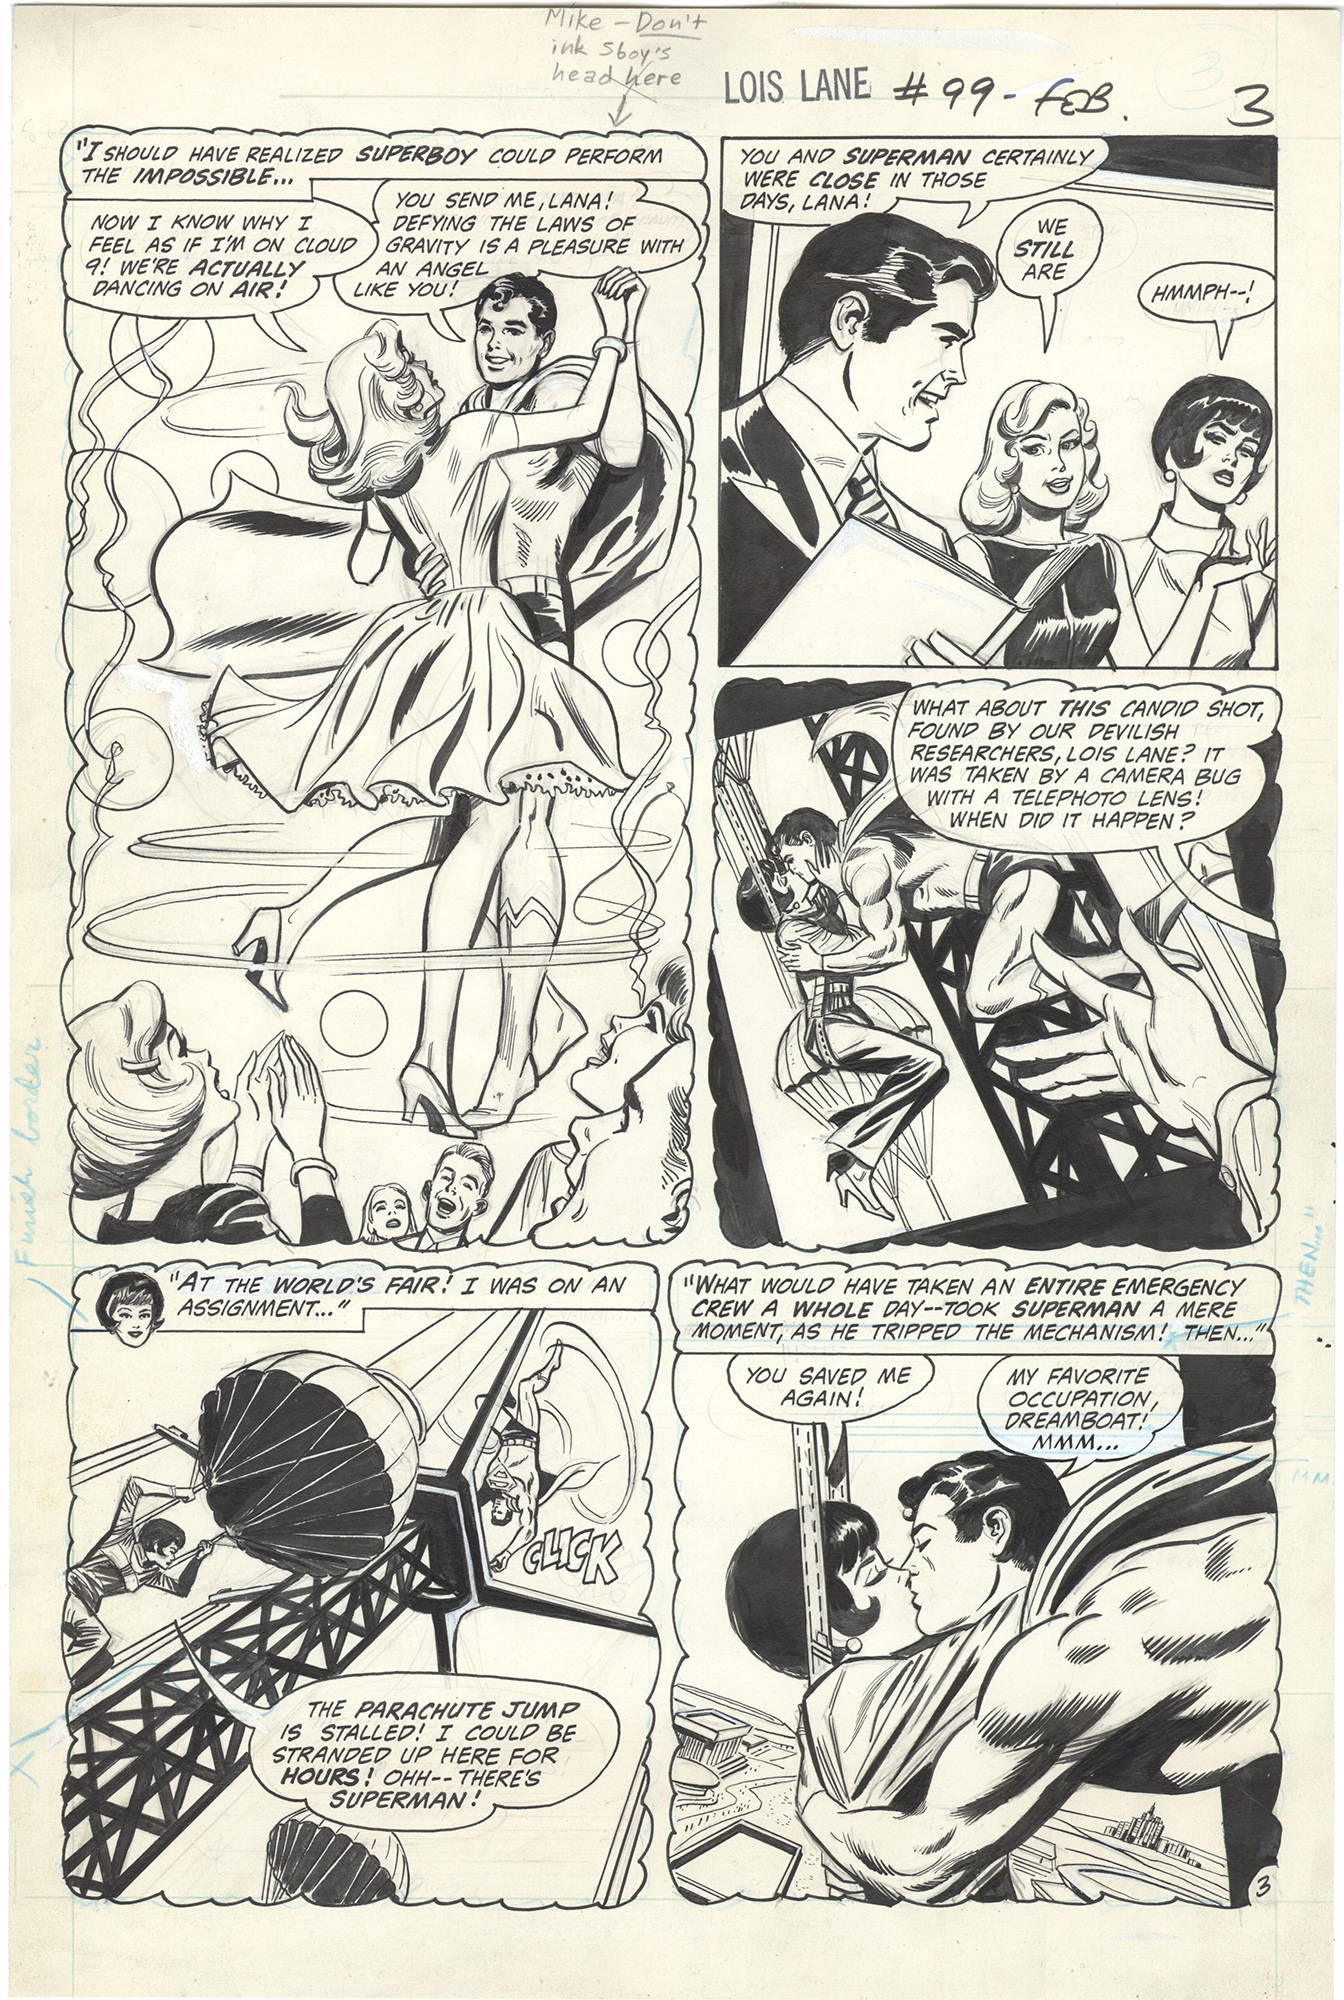 Superman's Girl Friend, Lois Lane #99 p3